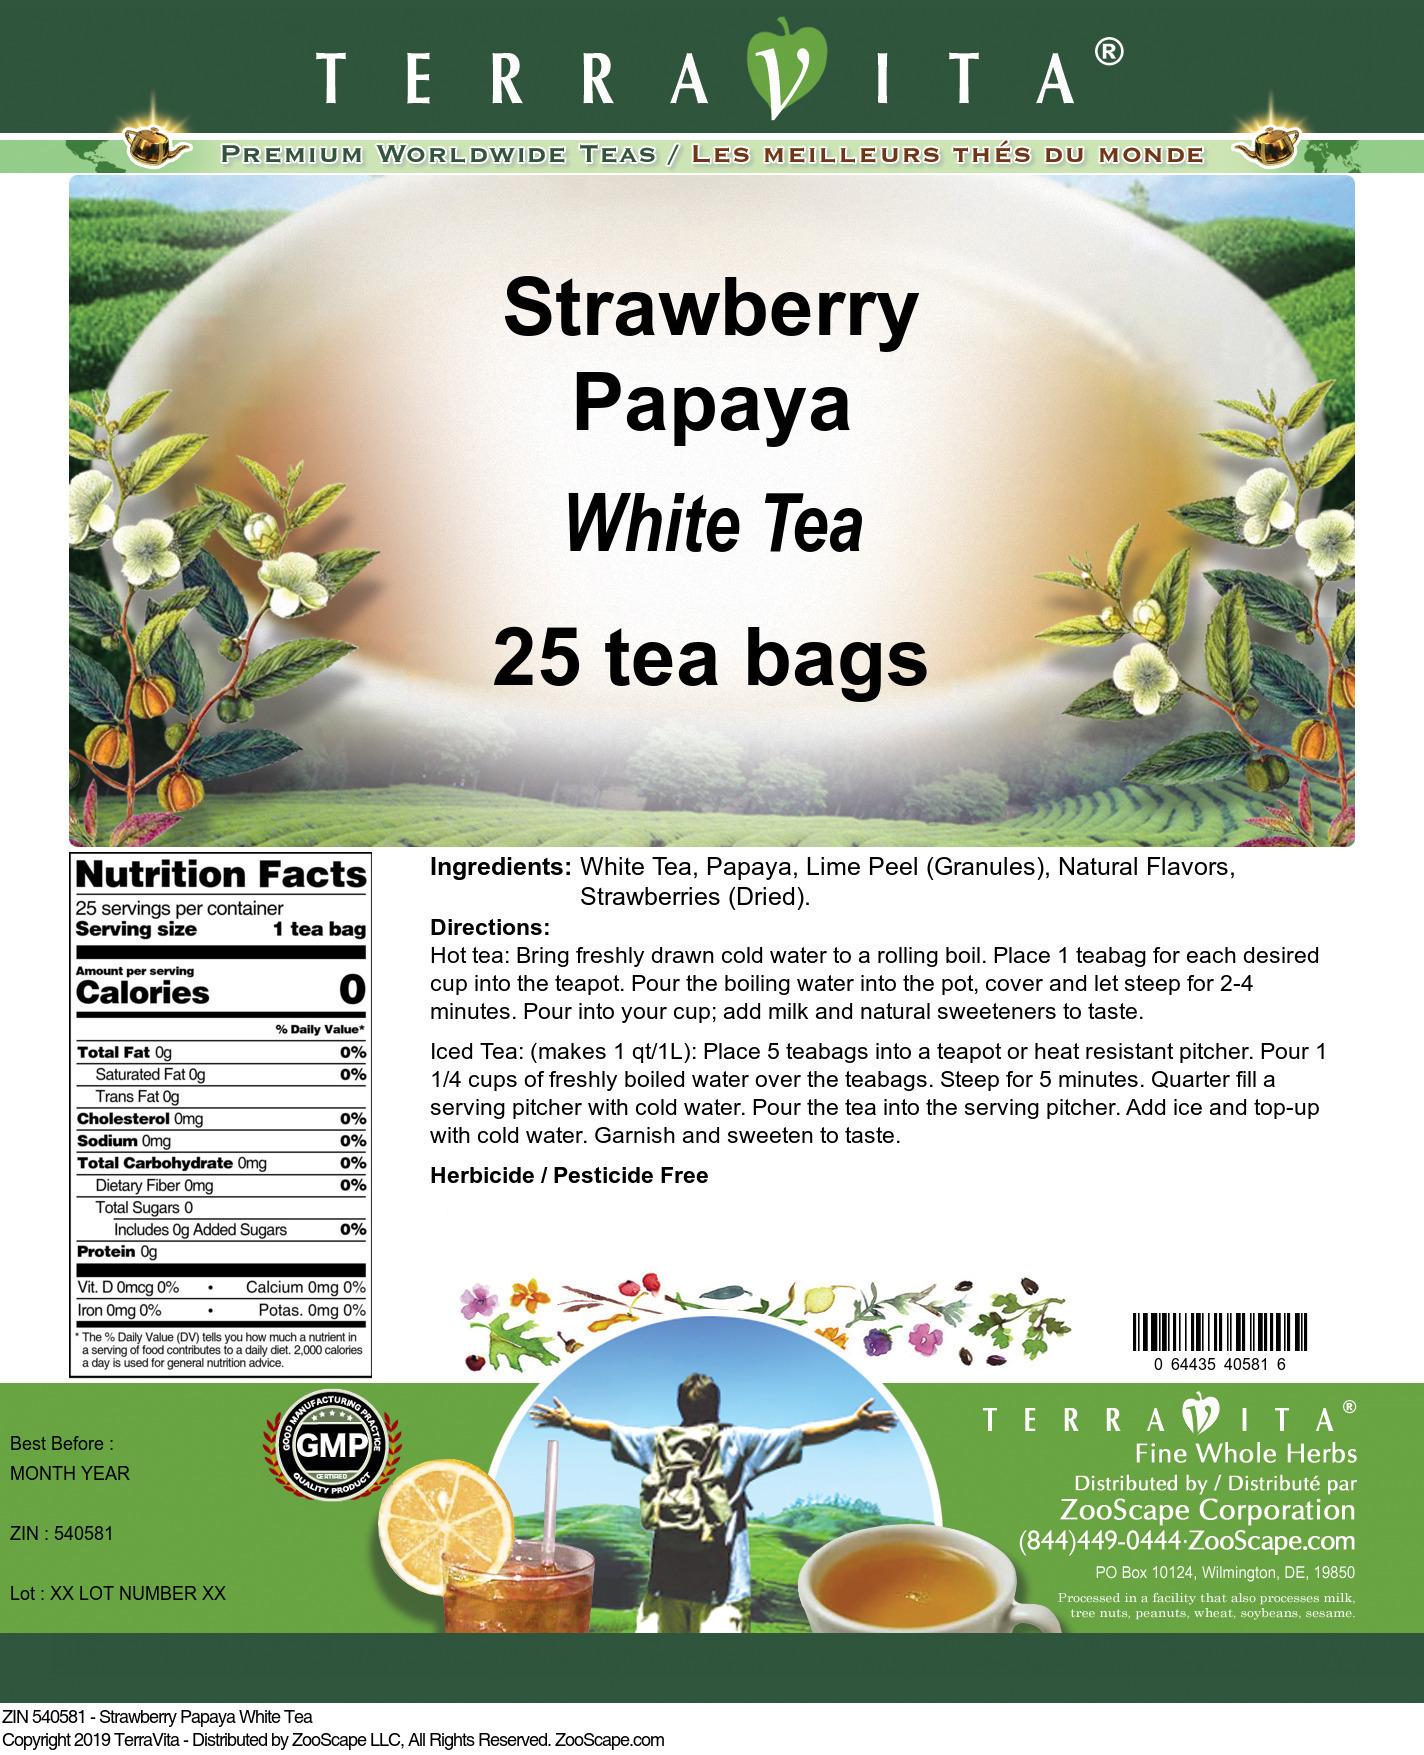 Strawberry Papaya White Tea